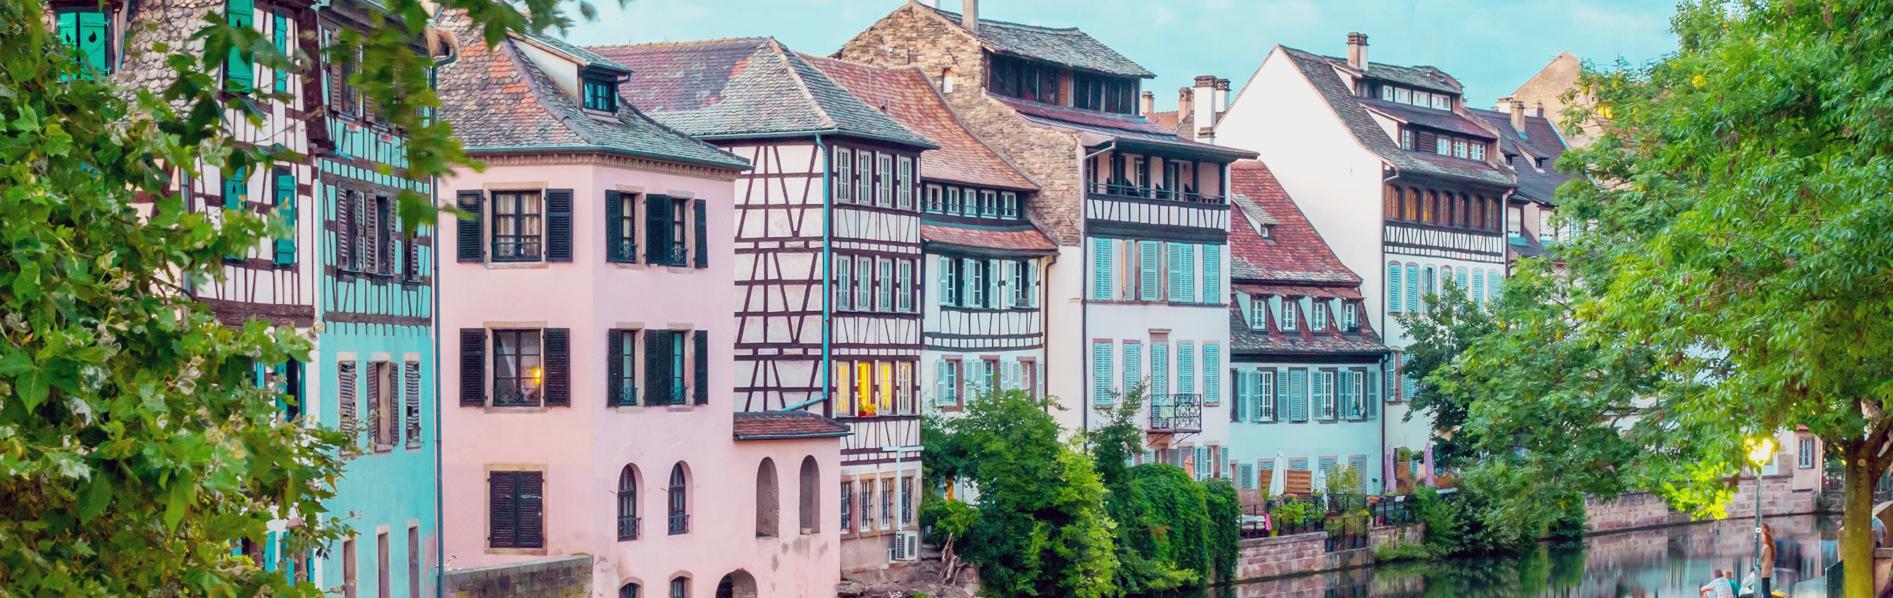 Objectif-immo67.fr Strasbourg Kochersberg maison appartement vente location